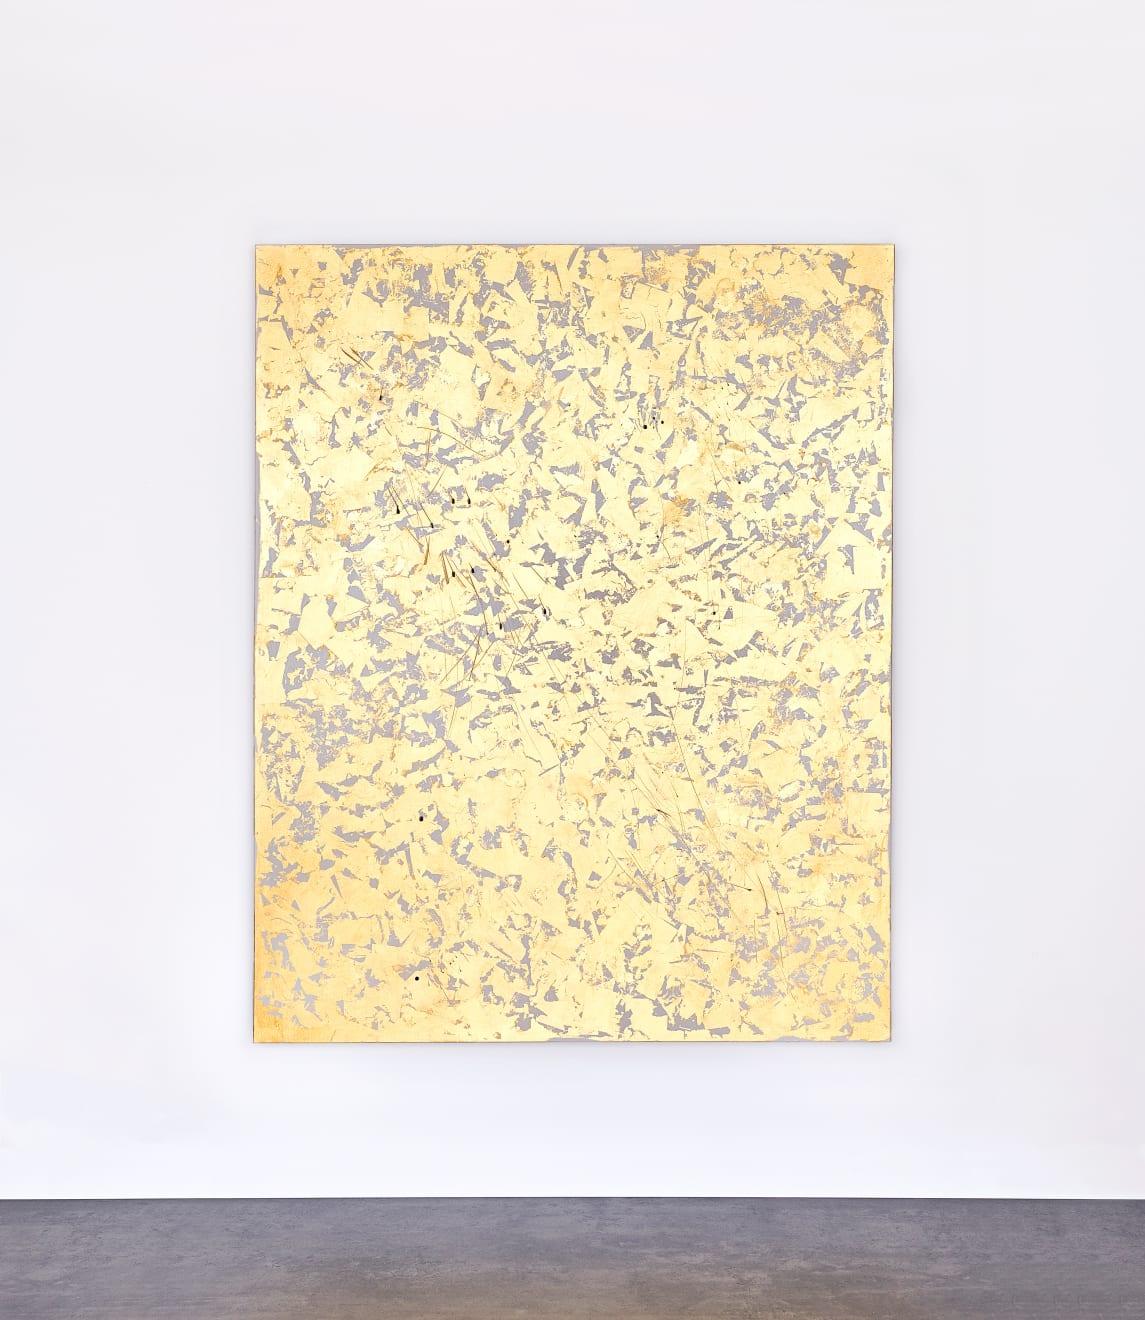 Jennifer Douglas, Golden Entropy, 2018